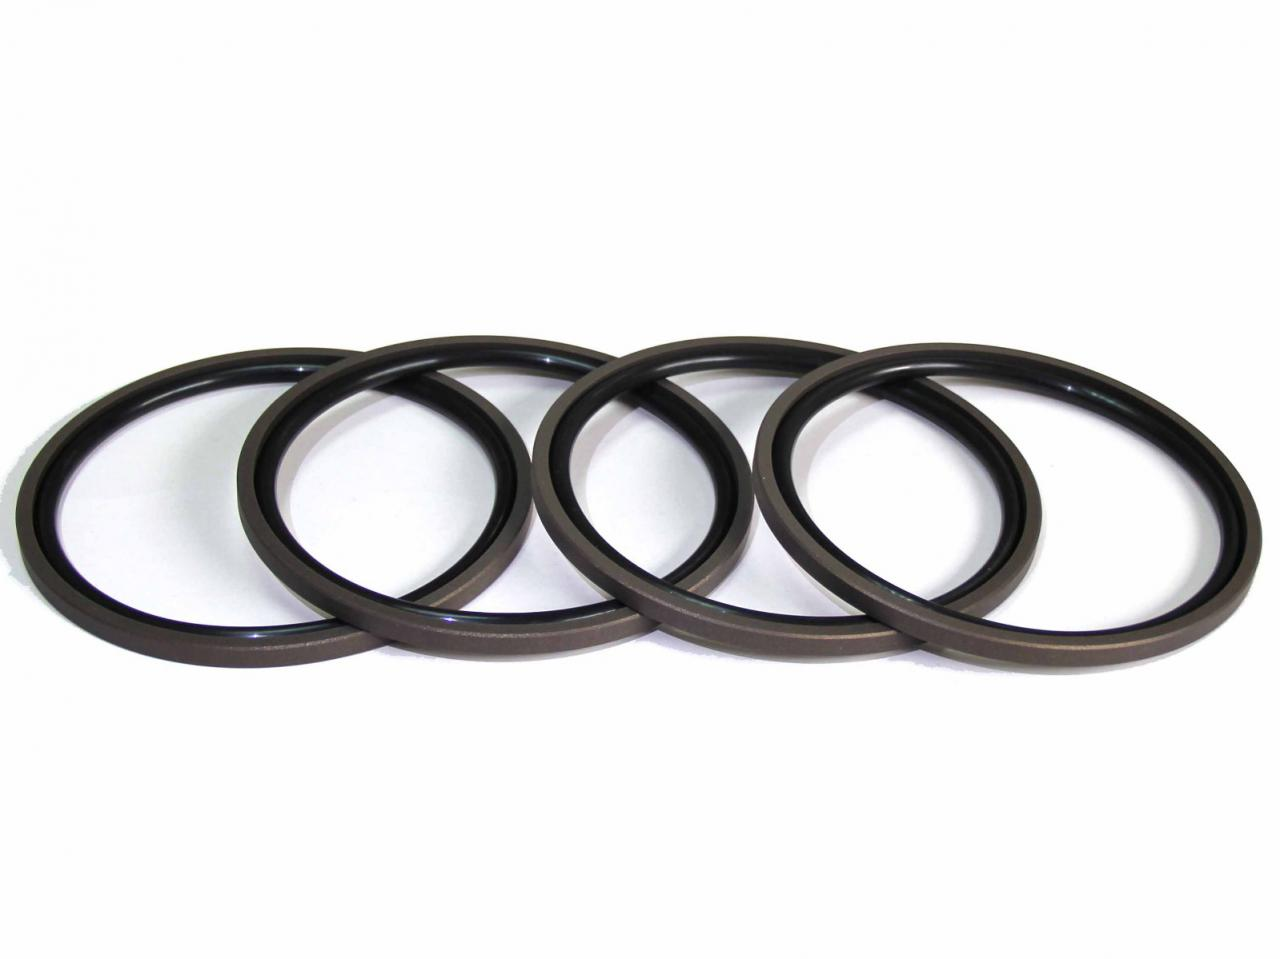 DSH-Piston Seal Design | Piston Seal Bronze Filled PTFE Glyd Ring-8